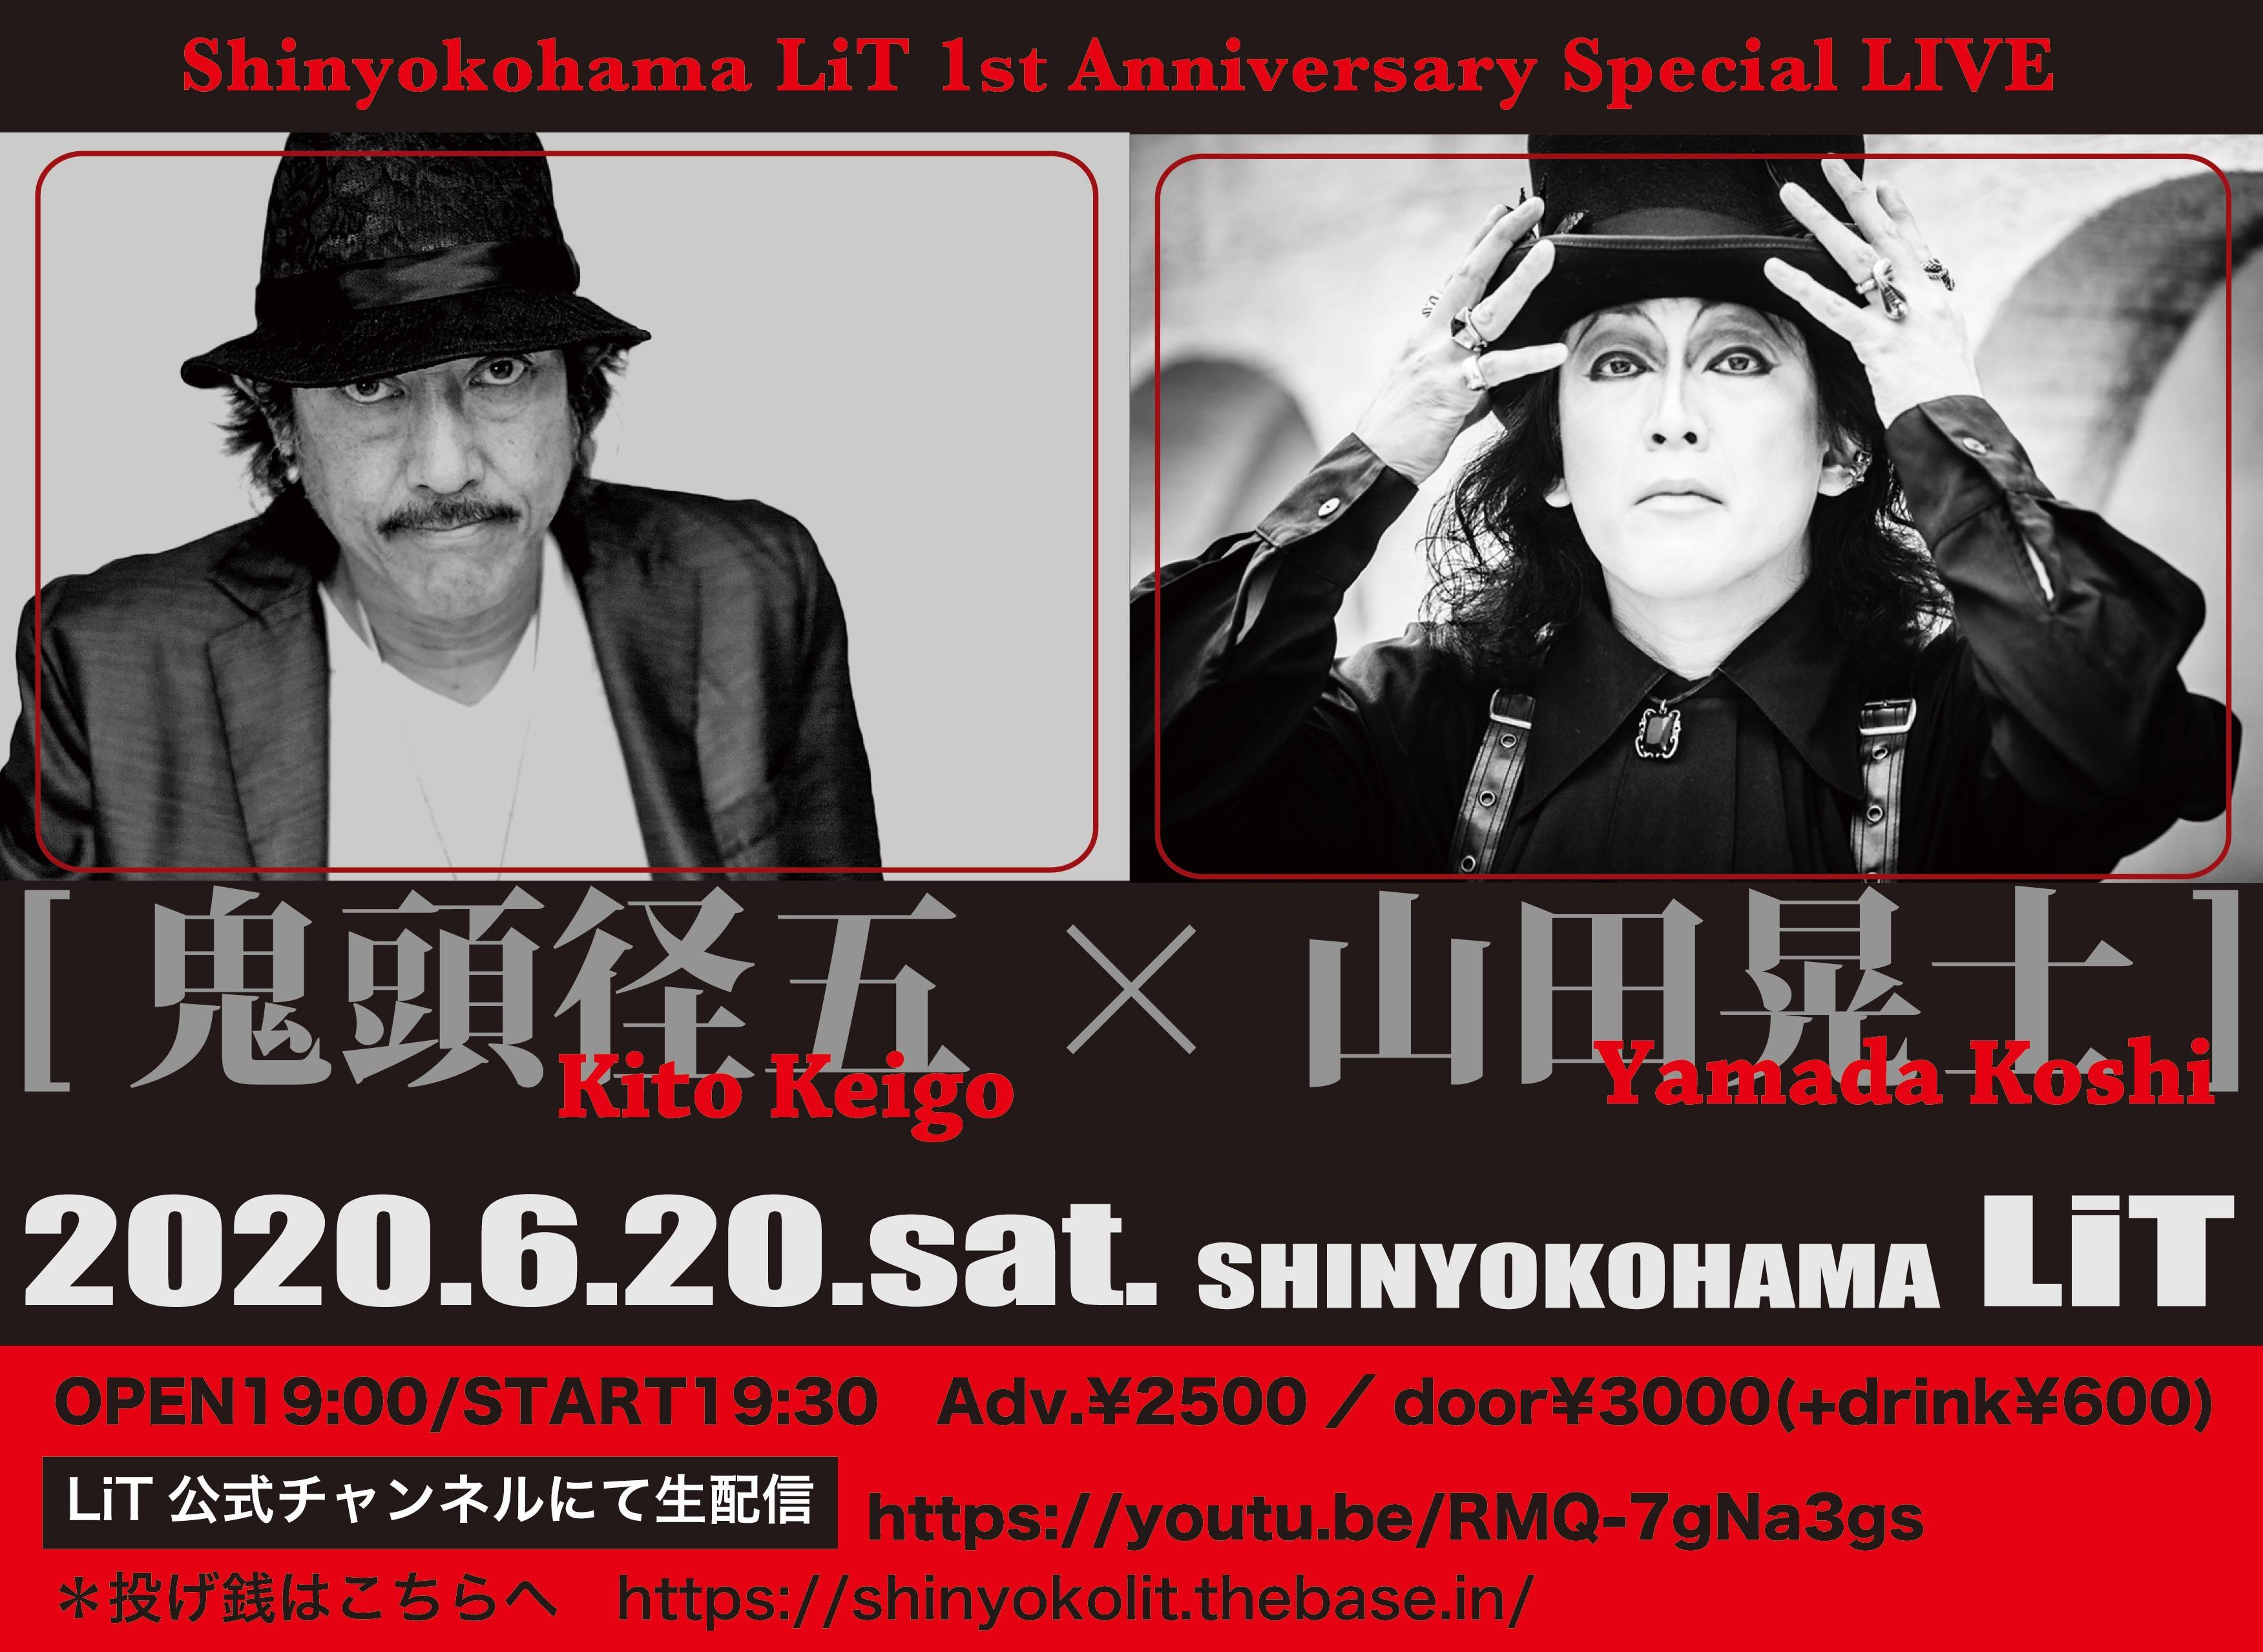 2020/6/20 [Shinyokohama LiT 1st Anniversary Special LIVE[鬼頭径五×山田晃士]]